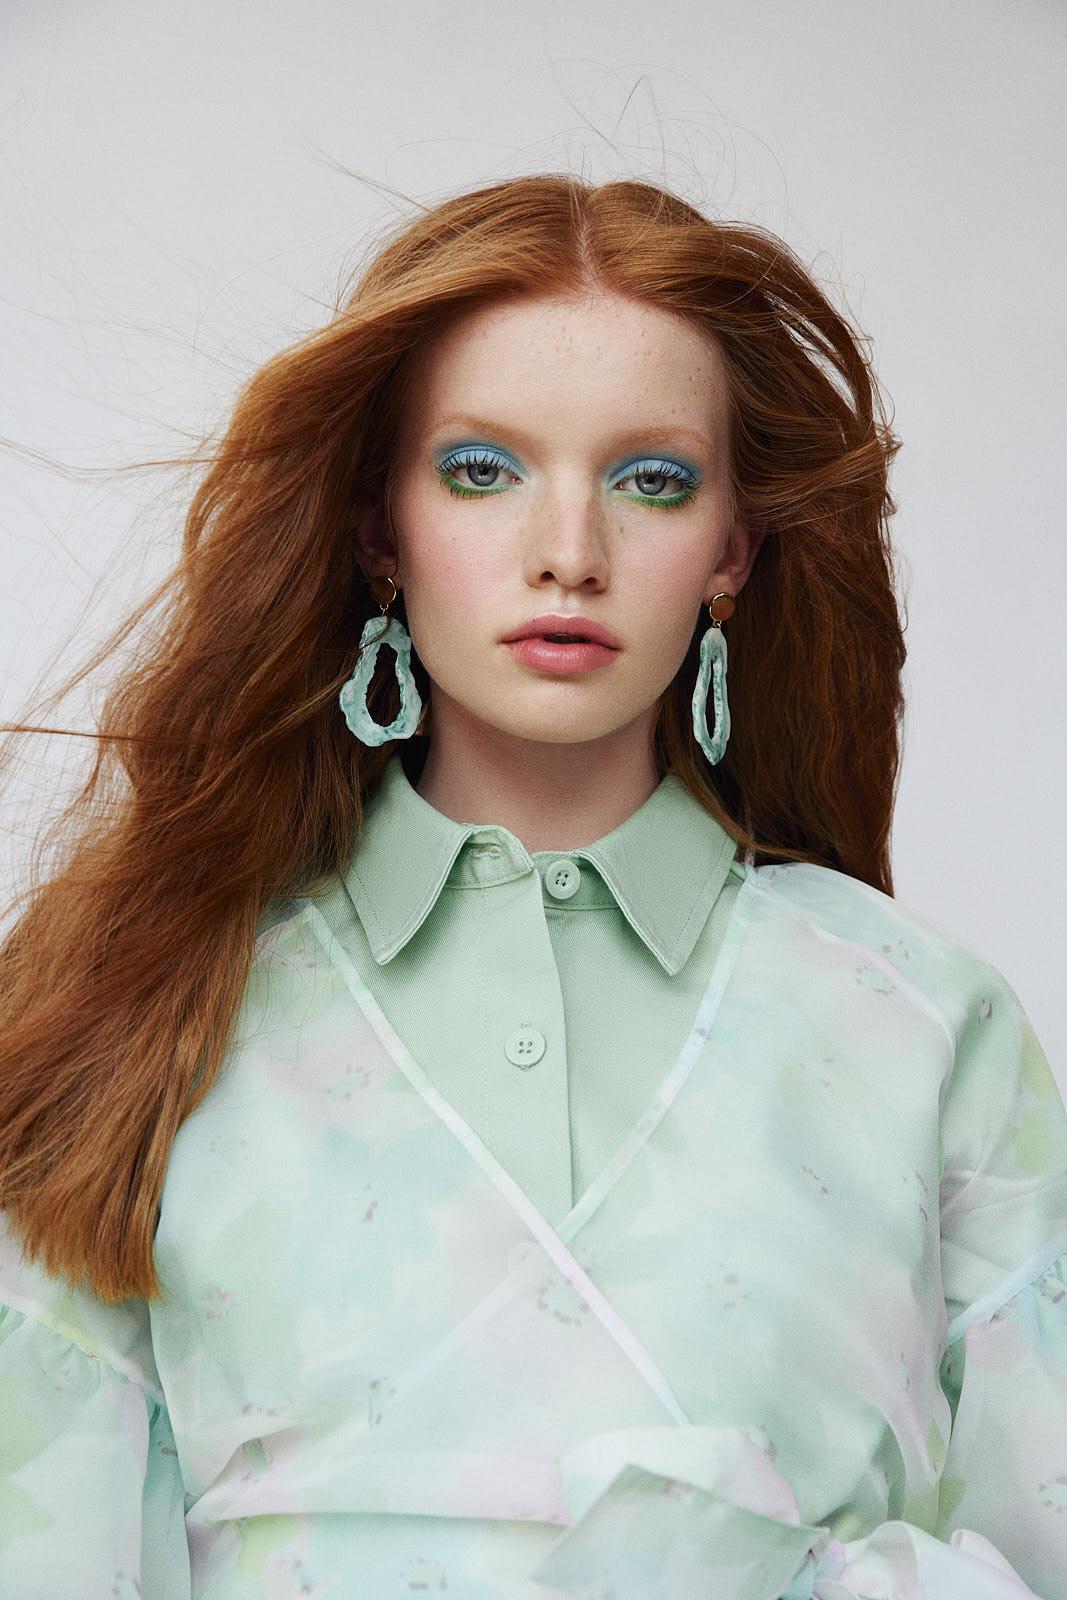 beauty beauty editorial BEAUTY PHOTOGRAPHER beauty photography beauty retouch Make Up pastel pastel make up retouch